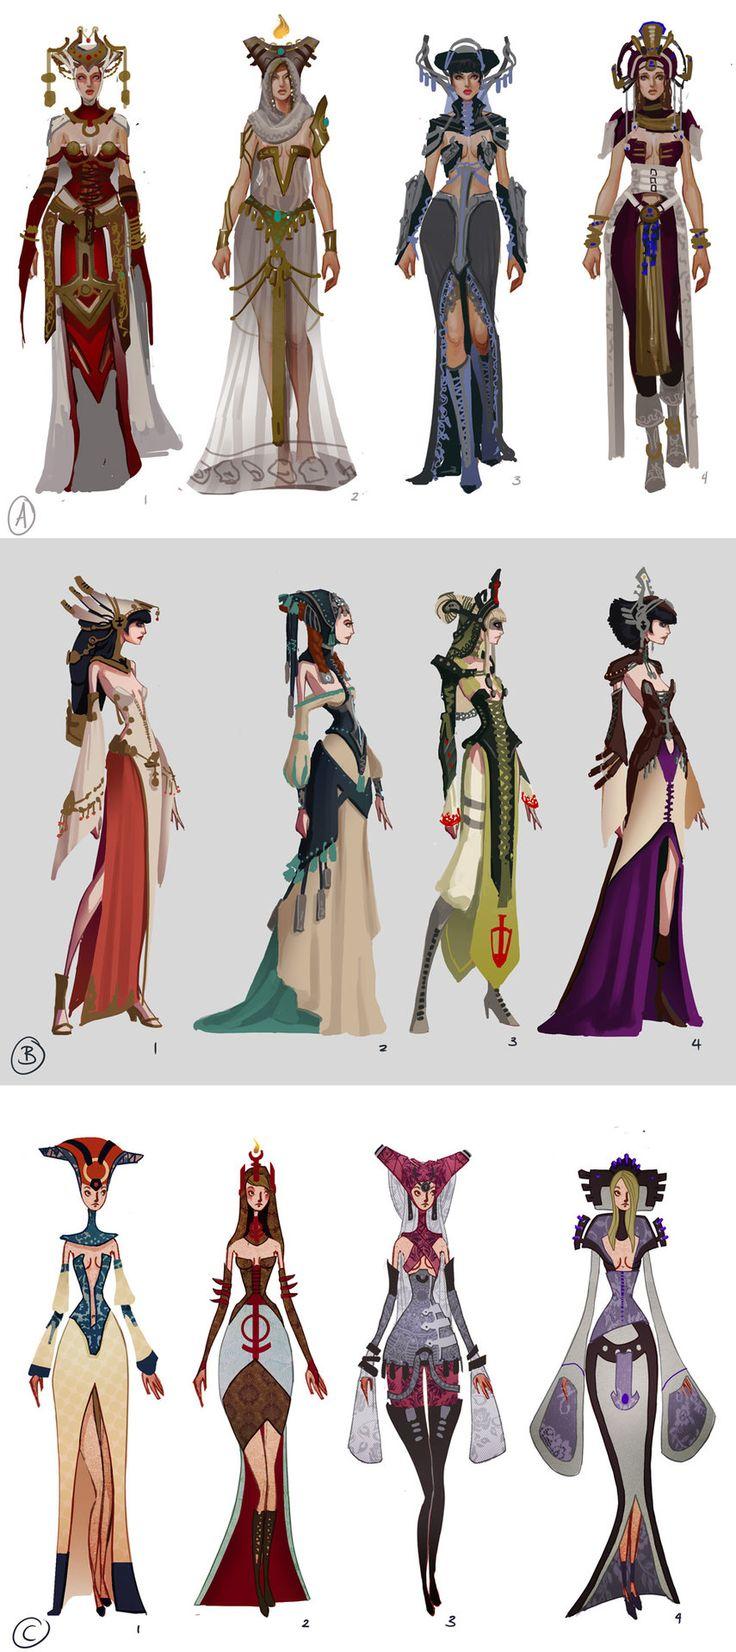 ArtStation - Alyvia - Order Priestess Exploration, Sam Hogg